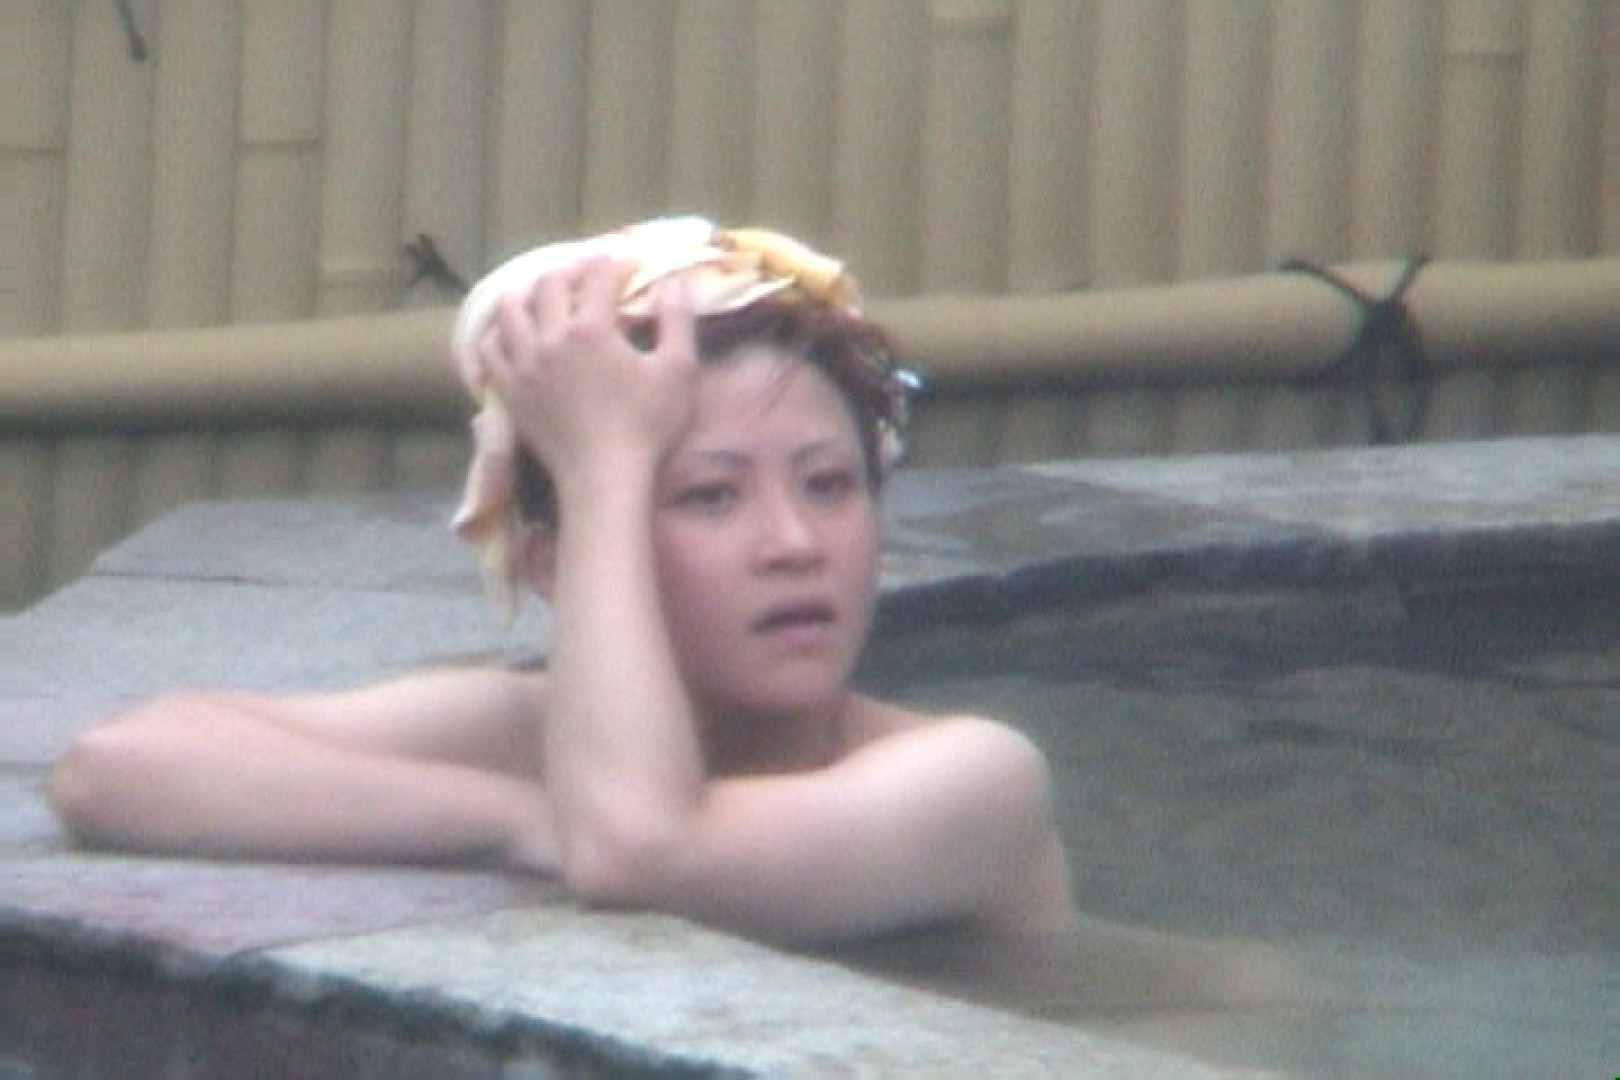 Aquaな露天風呂Vol.48【VIP限定】 盗撮 性交動画流出 74連発 32